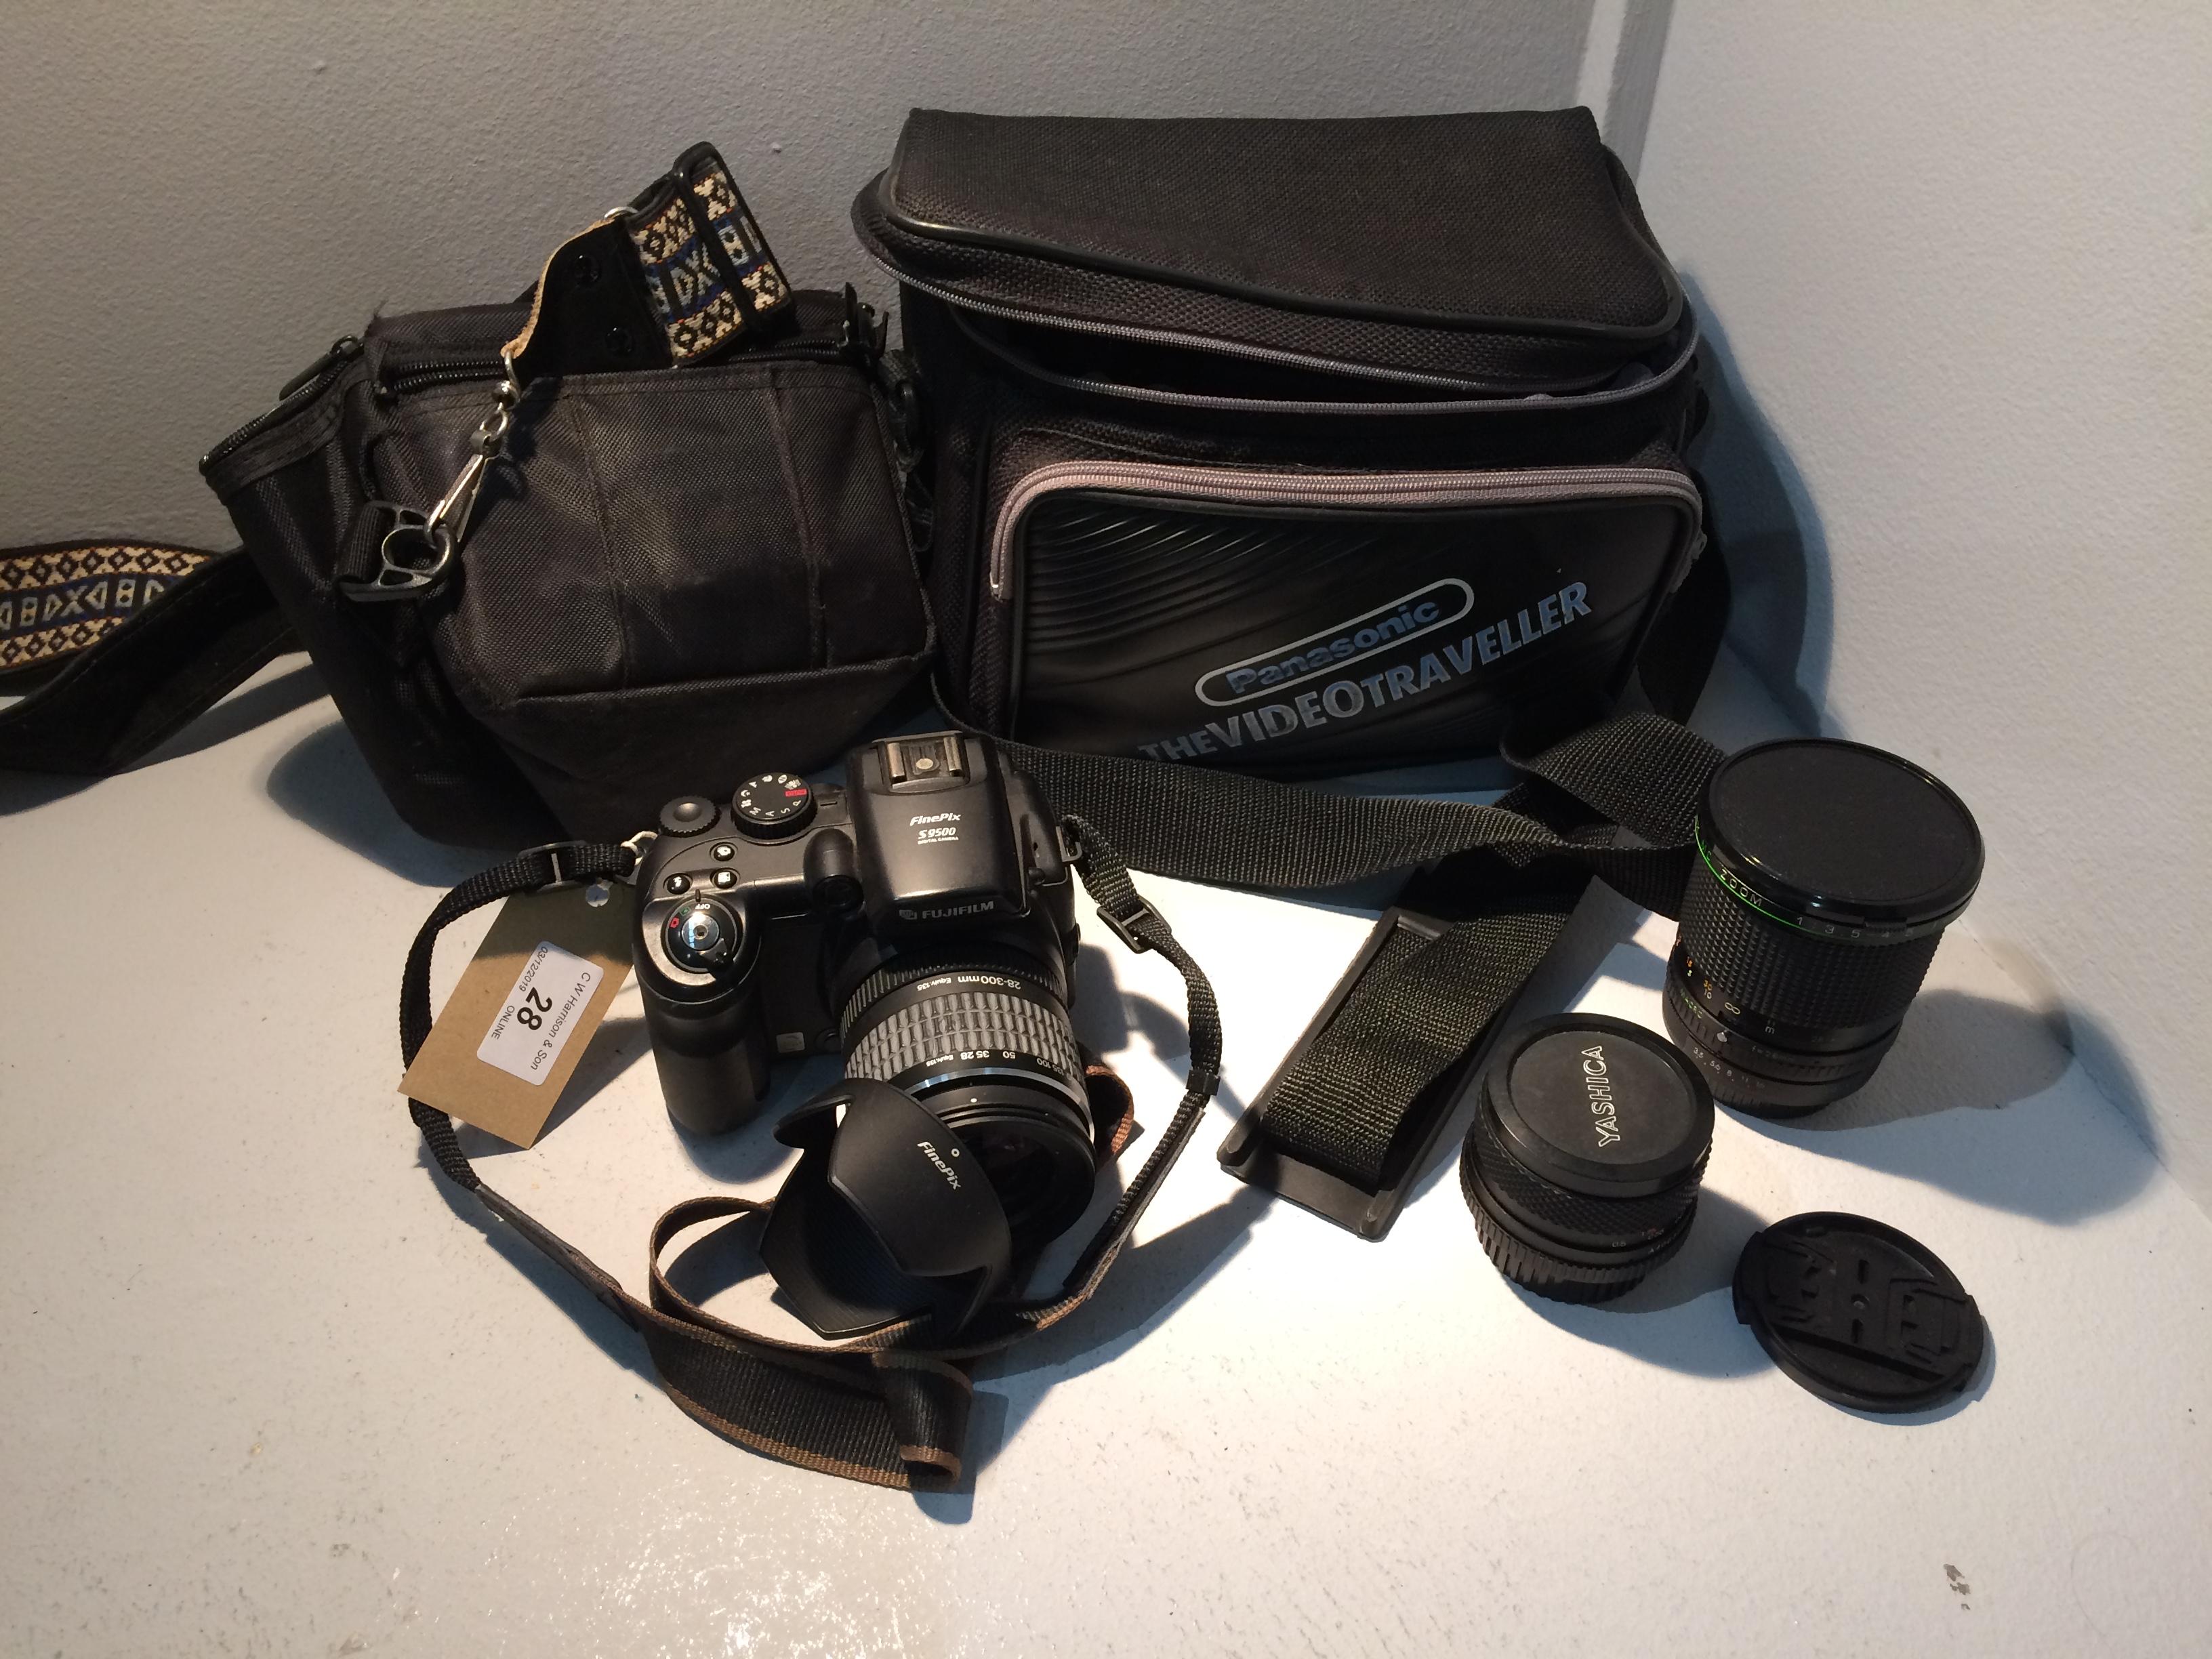 Lot 28 - Fujifilm Finepix S9500 digital camera complete with travel bag, Hanimex MC1..3.5 - 4.